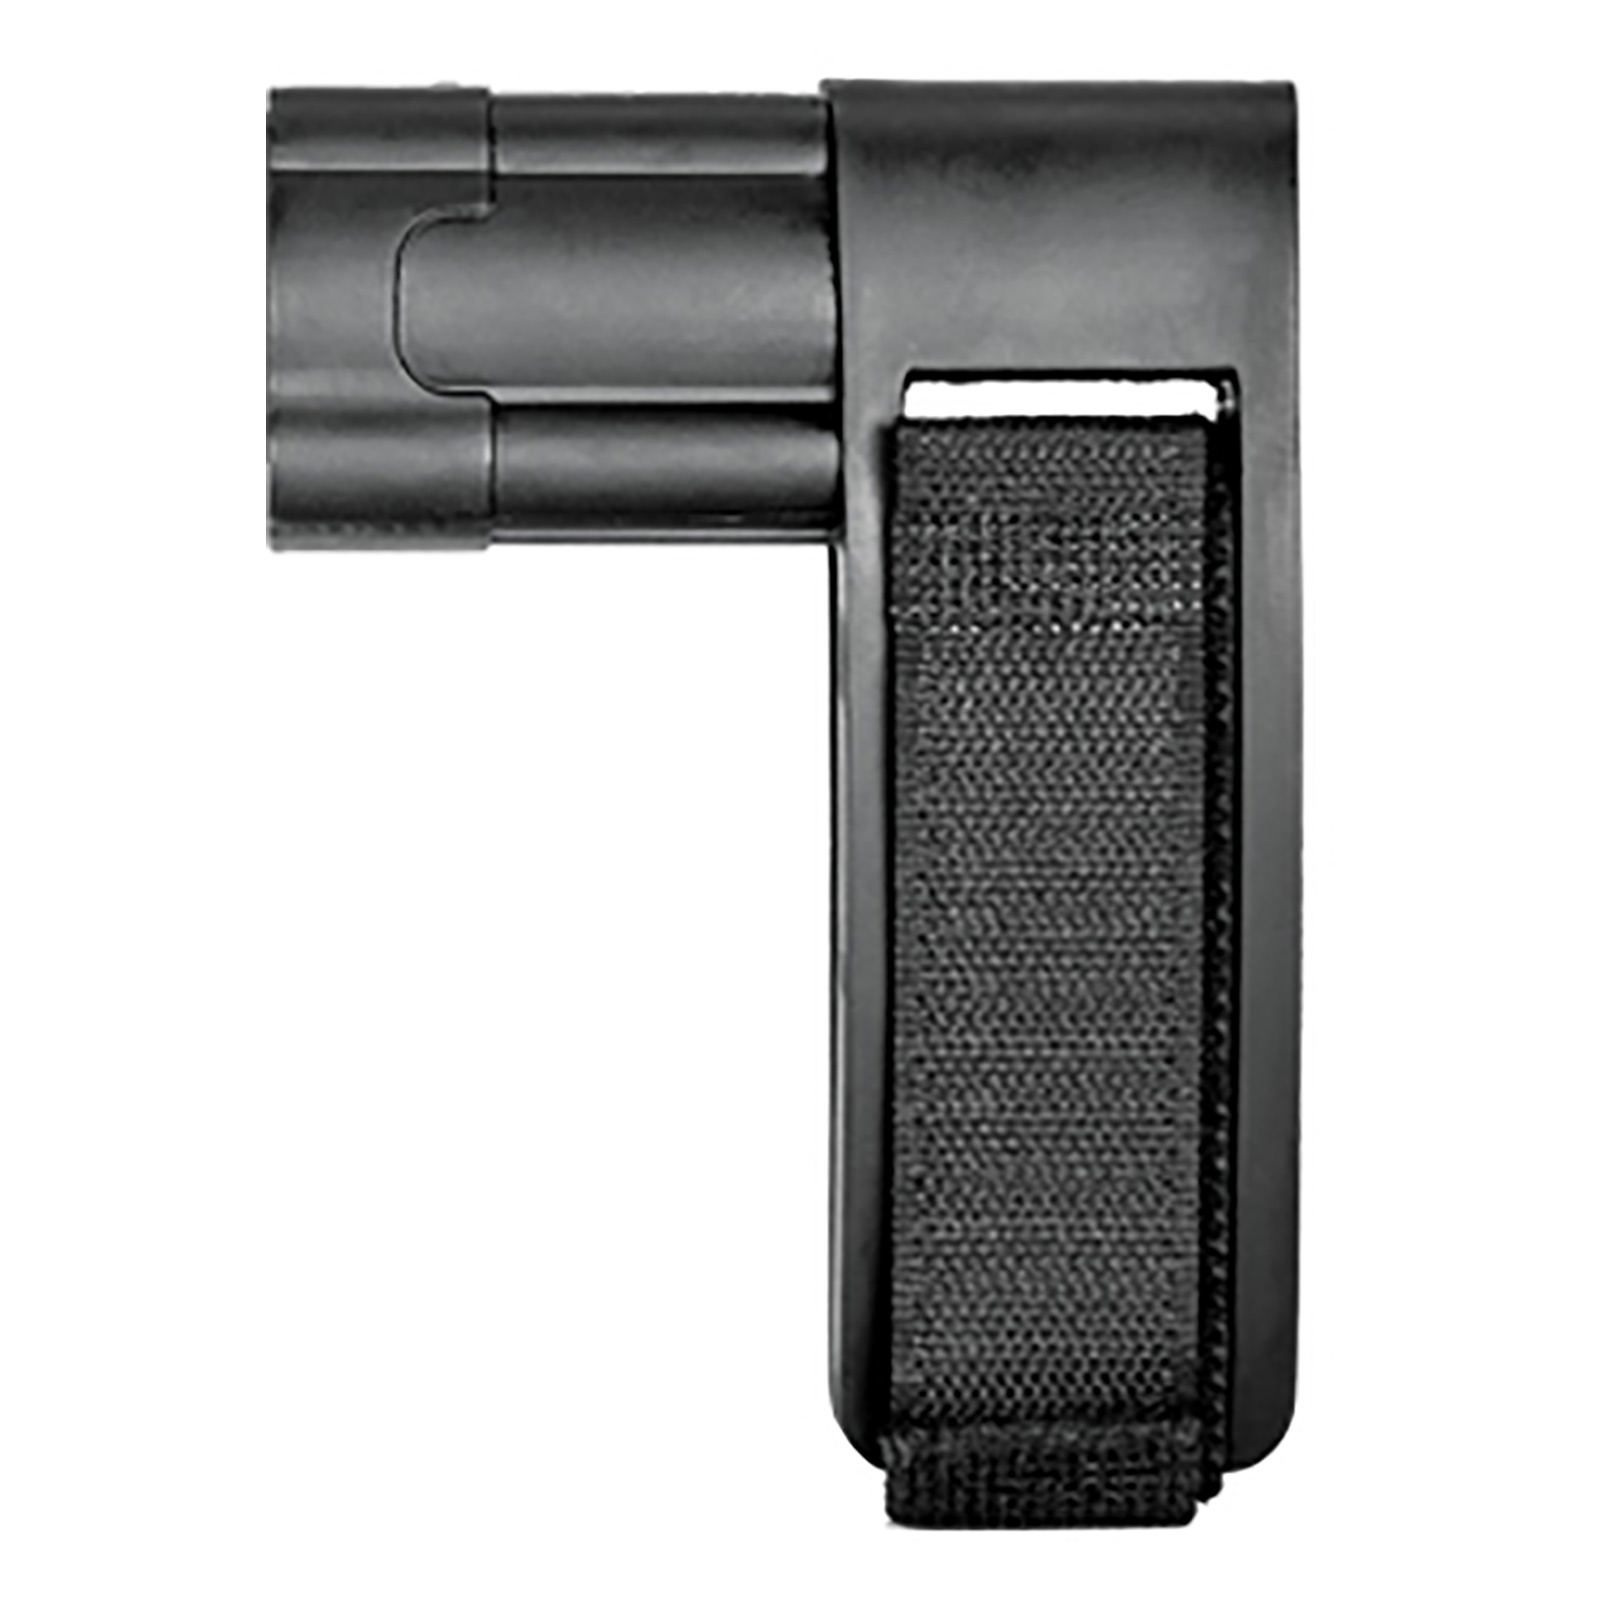 sb-tactical-ar-pistol-stabilizing-brace-sb-mini-180618-3